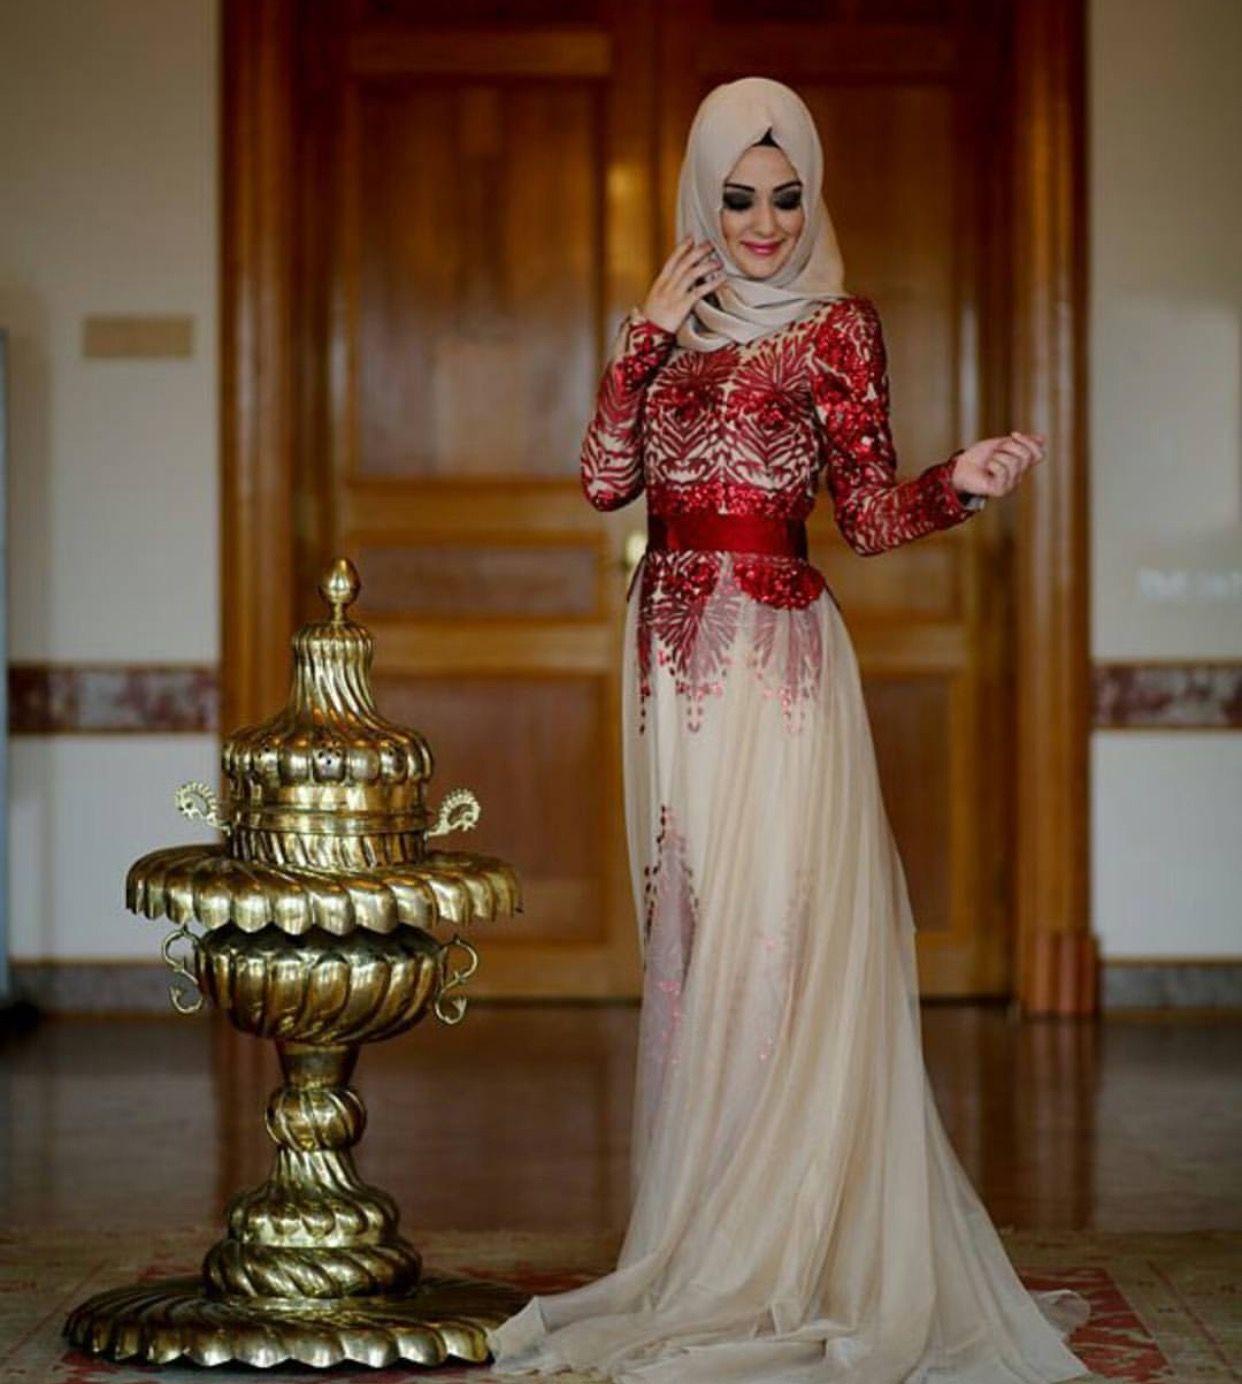 Pin by cindy loomistorvi on muslim weddings pinterest